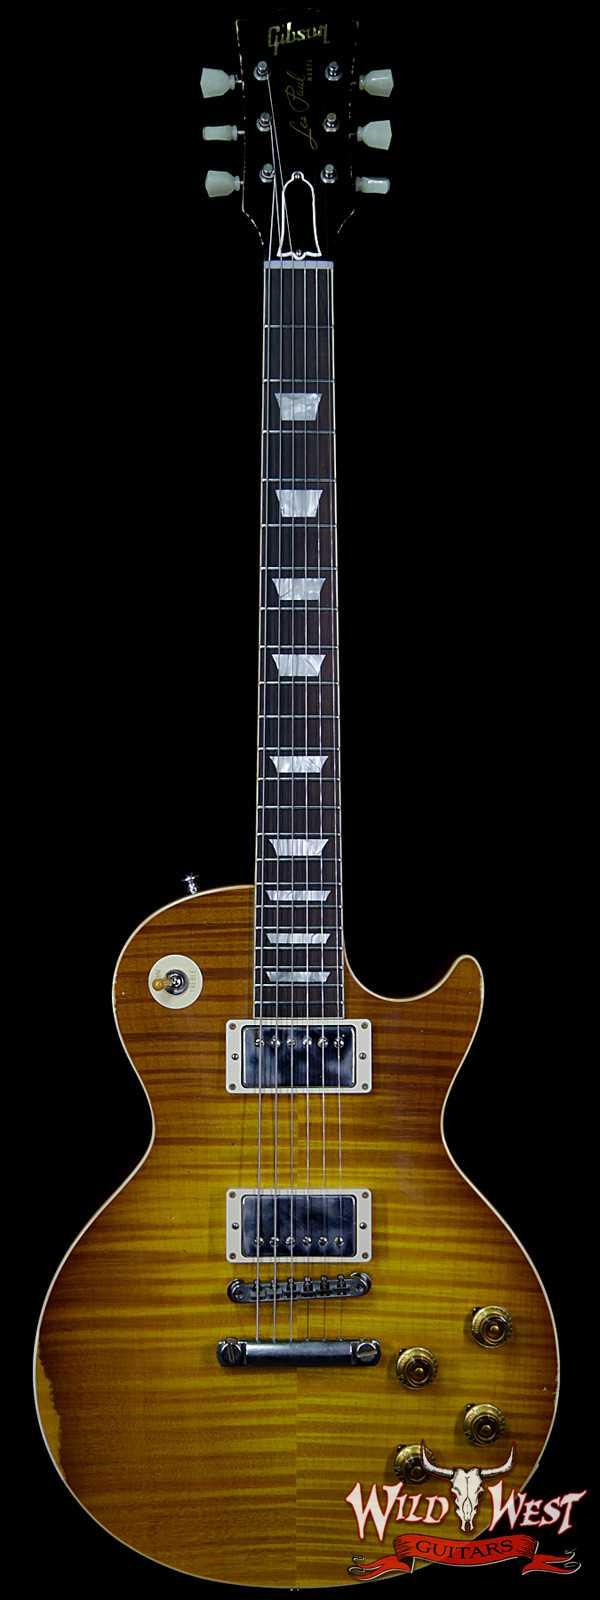 Gibson Custom Shop 1959 Les Paul Aged R9 Hand Selected Killer Top Brazilian Rosewood Board Honey Lemon Fade 8.10 Lbs